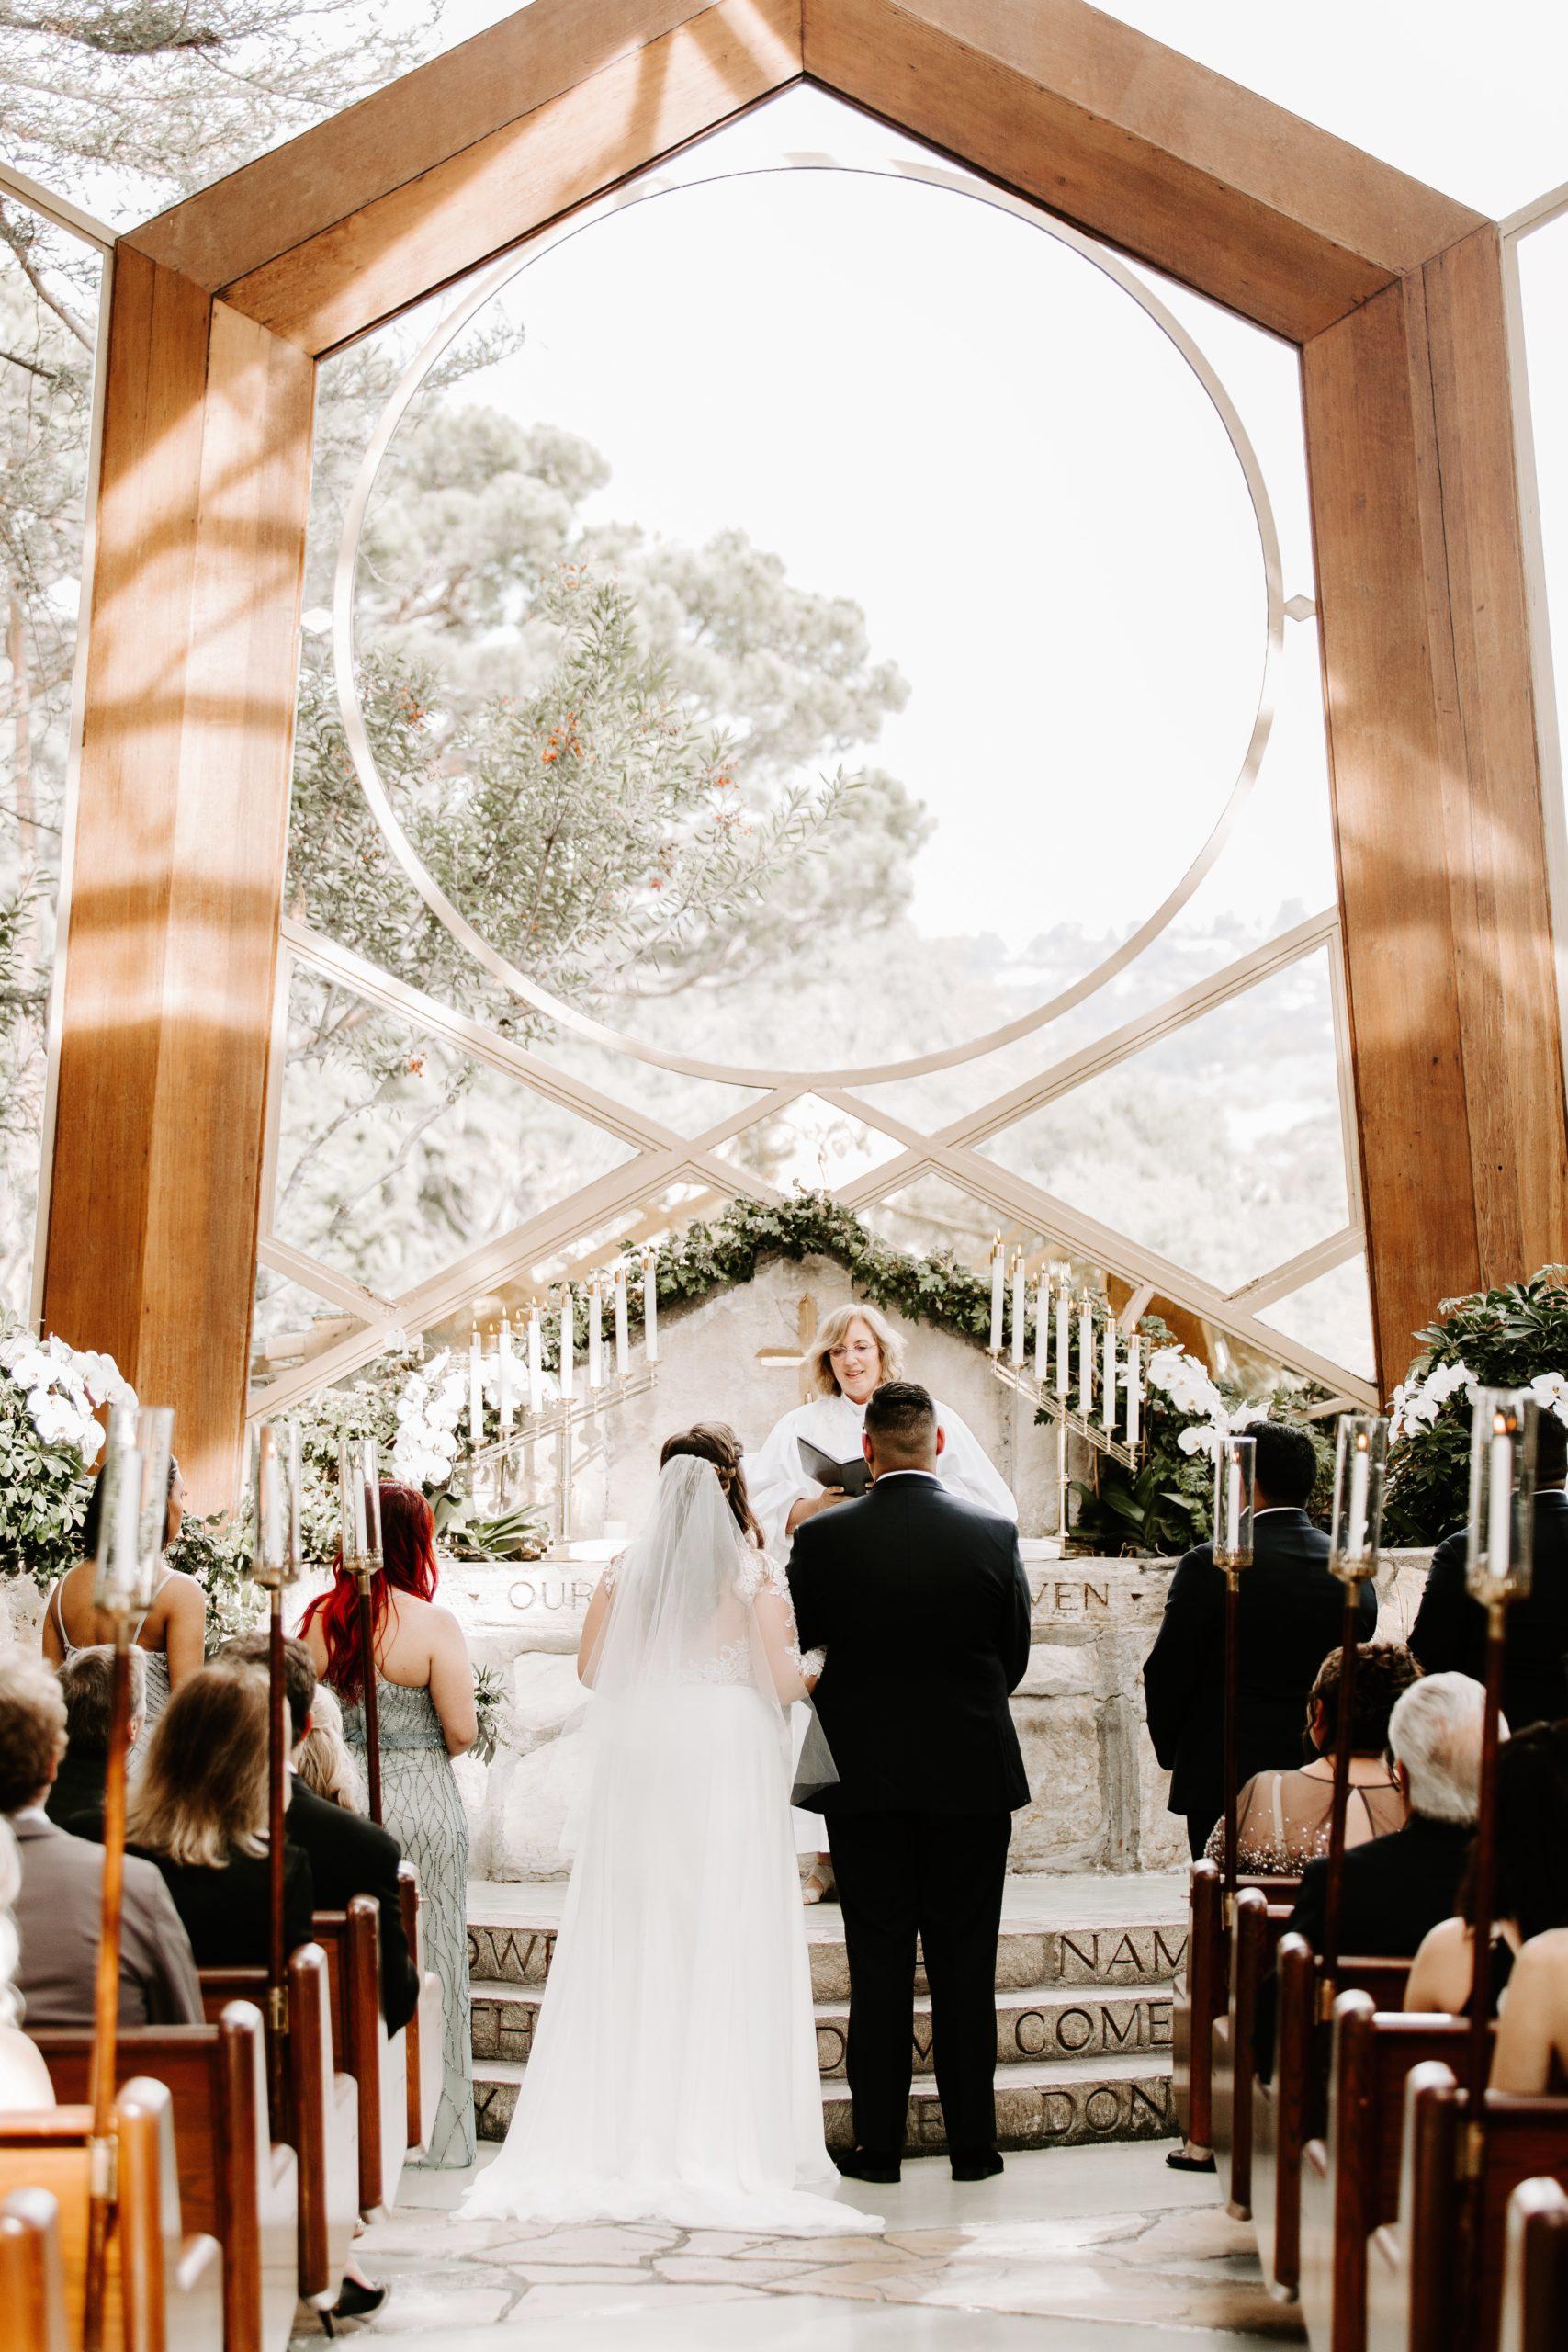 Wedding ceremony at Wayfarers Chapel